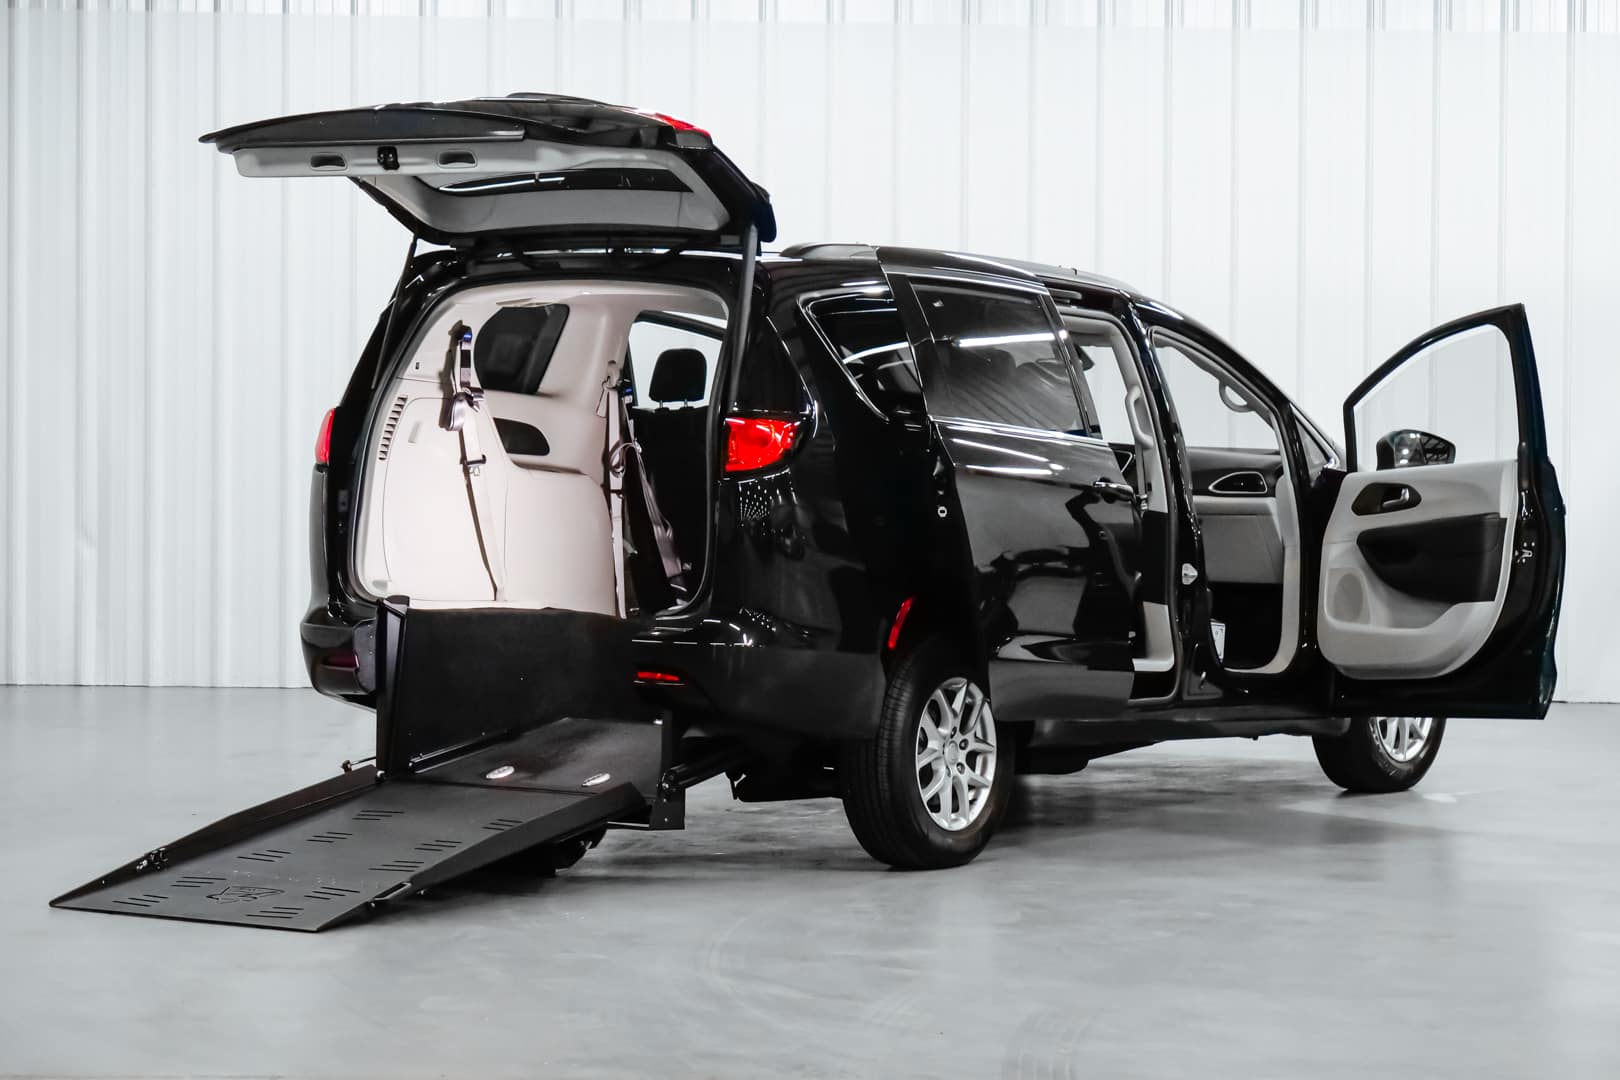 Wheelchair Accessible Chrysler Voyager rear ramp open